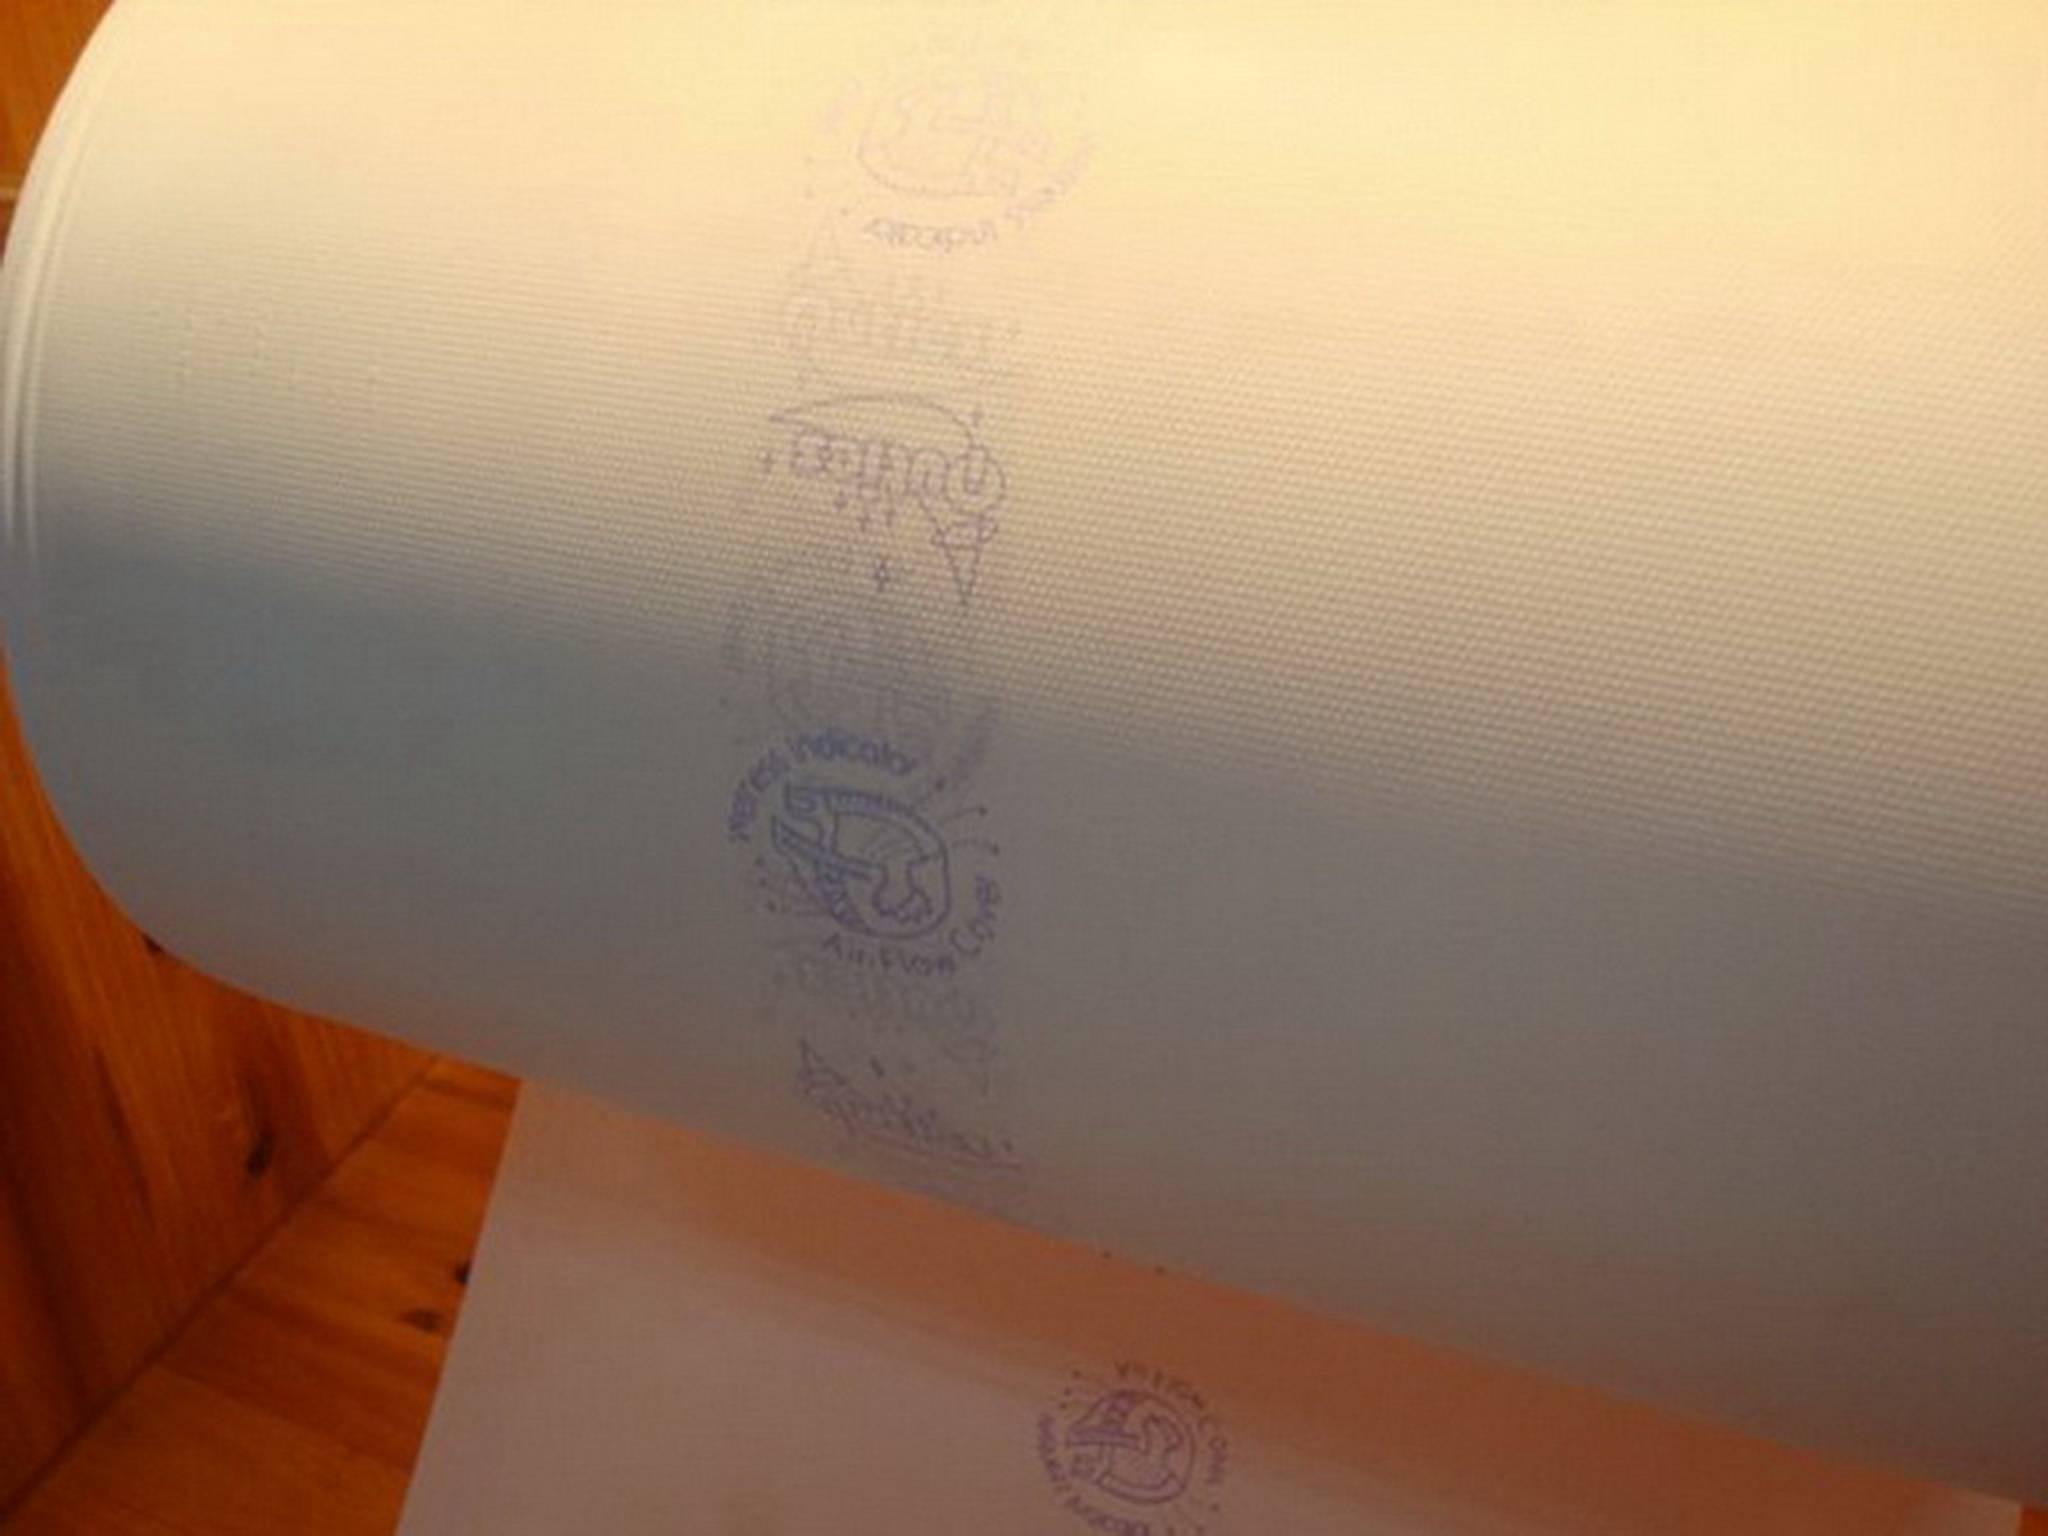 Full Laminated Embossed PE Film for Baby Diaper Backsheet with Wetness Indicator